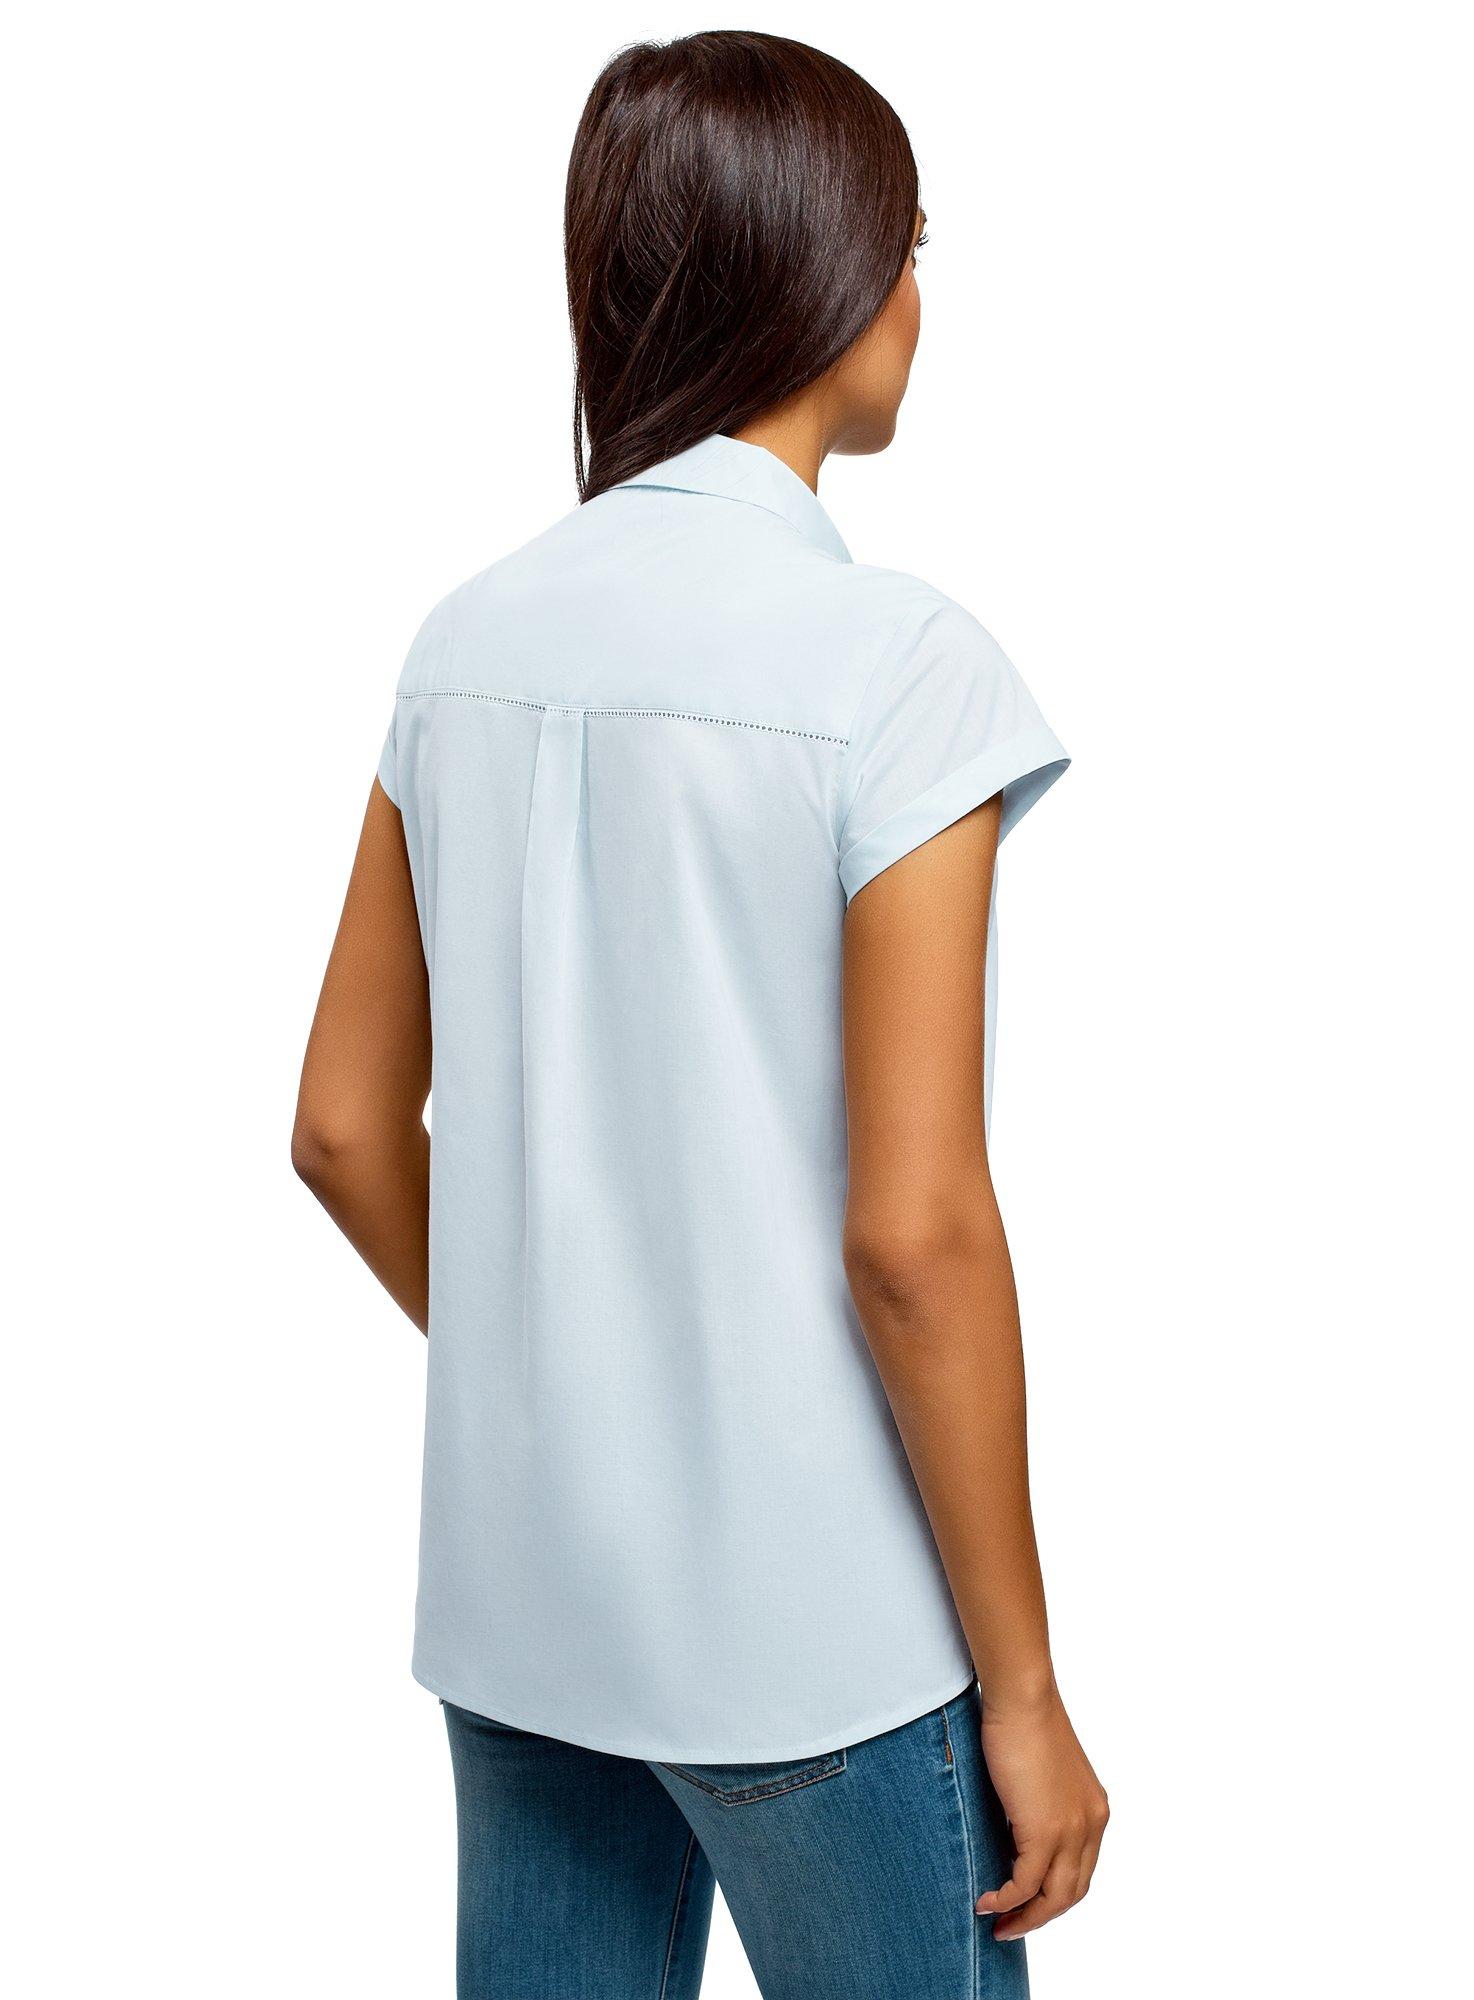 oodji Ultra Women's Short Sleeve Cotton Shirt with Turn-Ups, Blue, 2 by oodji (Image #3)